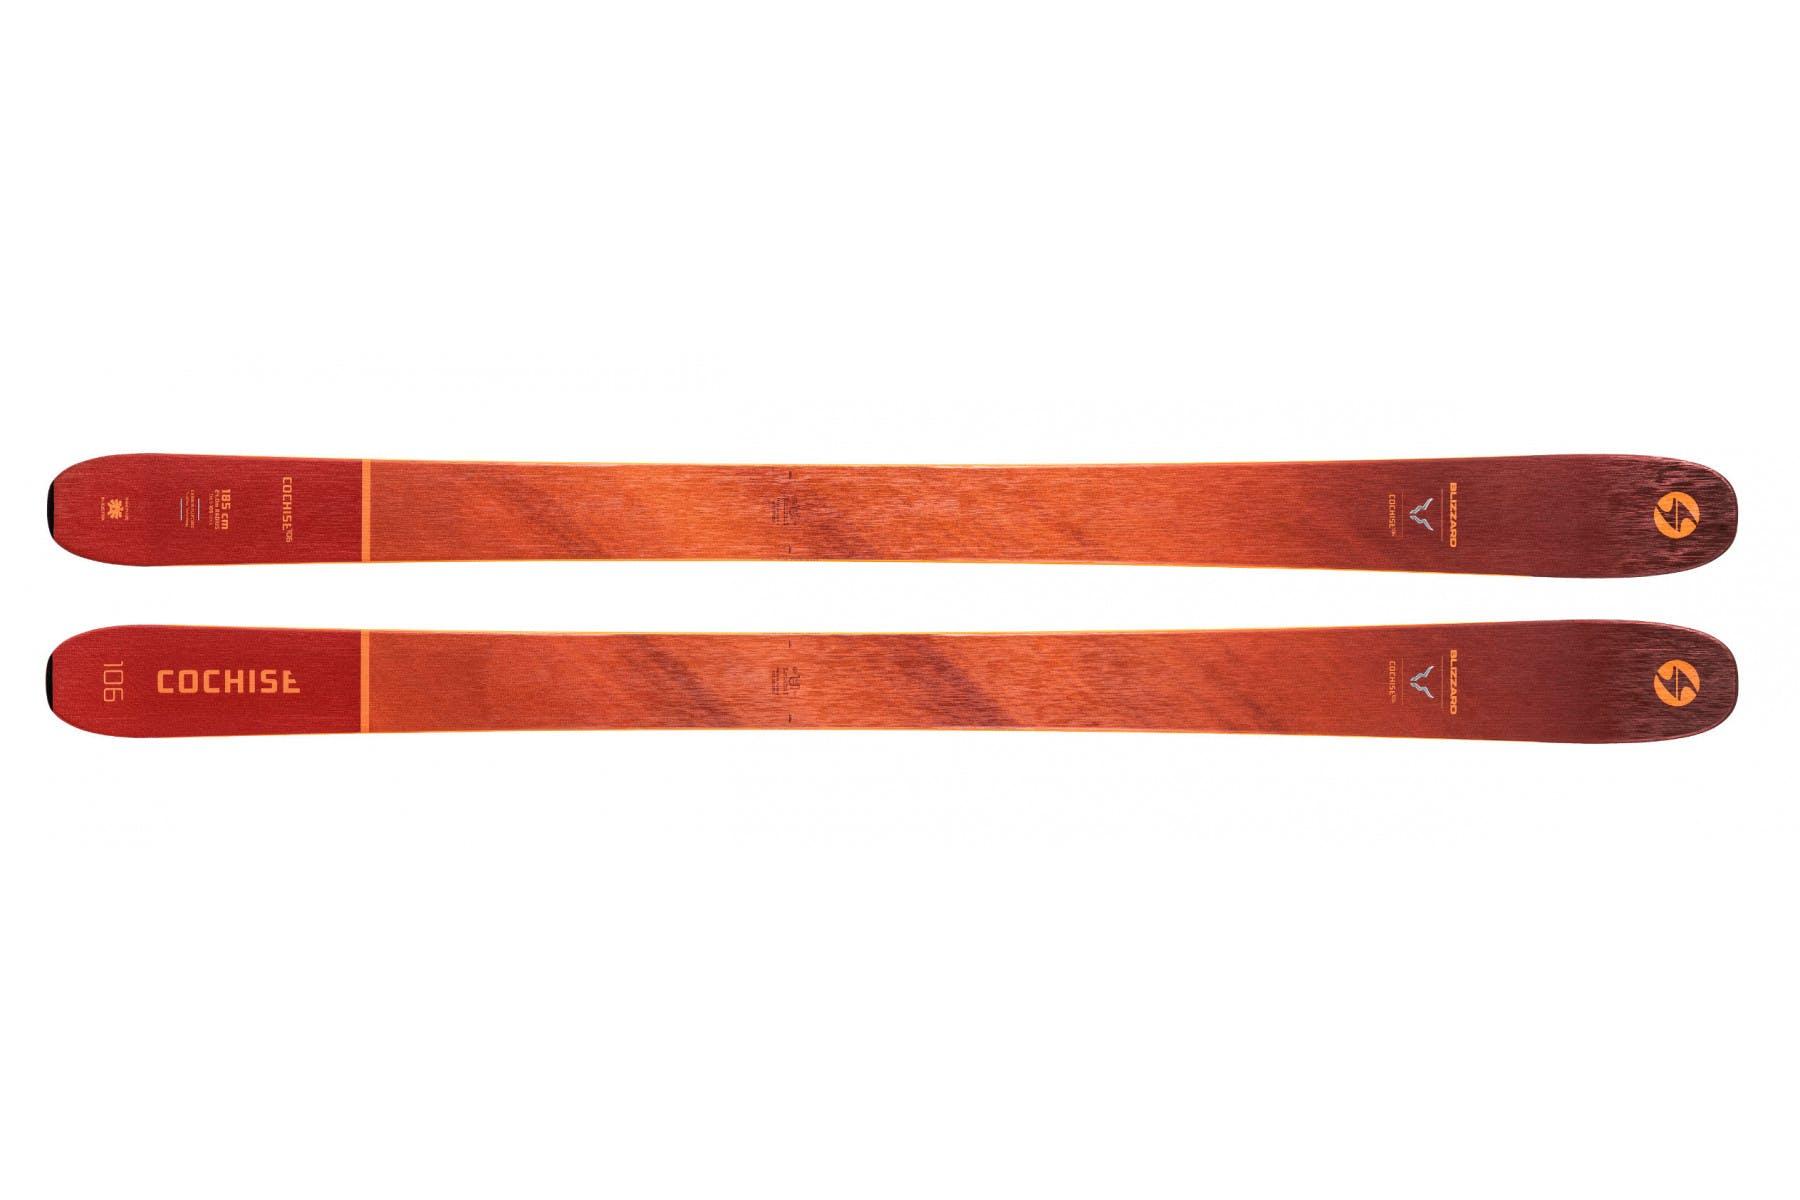 Blizzard Cochise 106 Skis · 2022